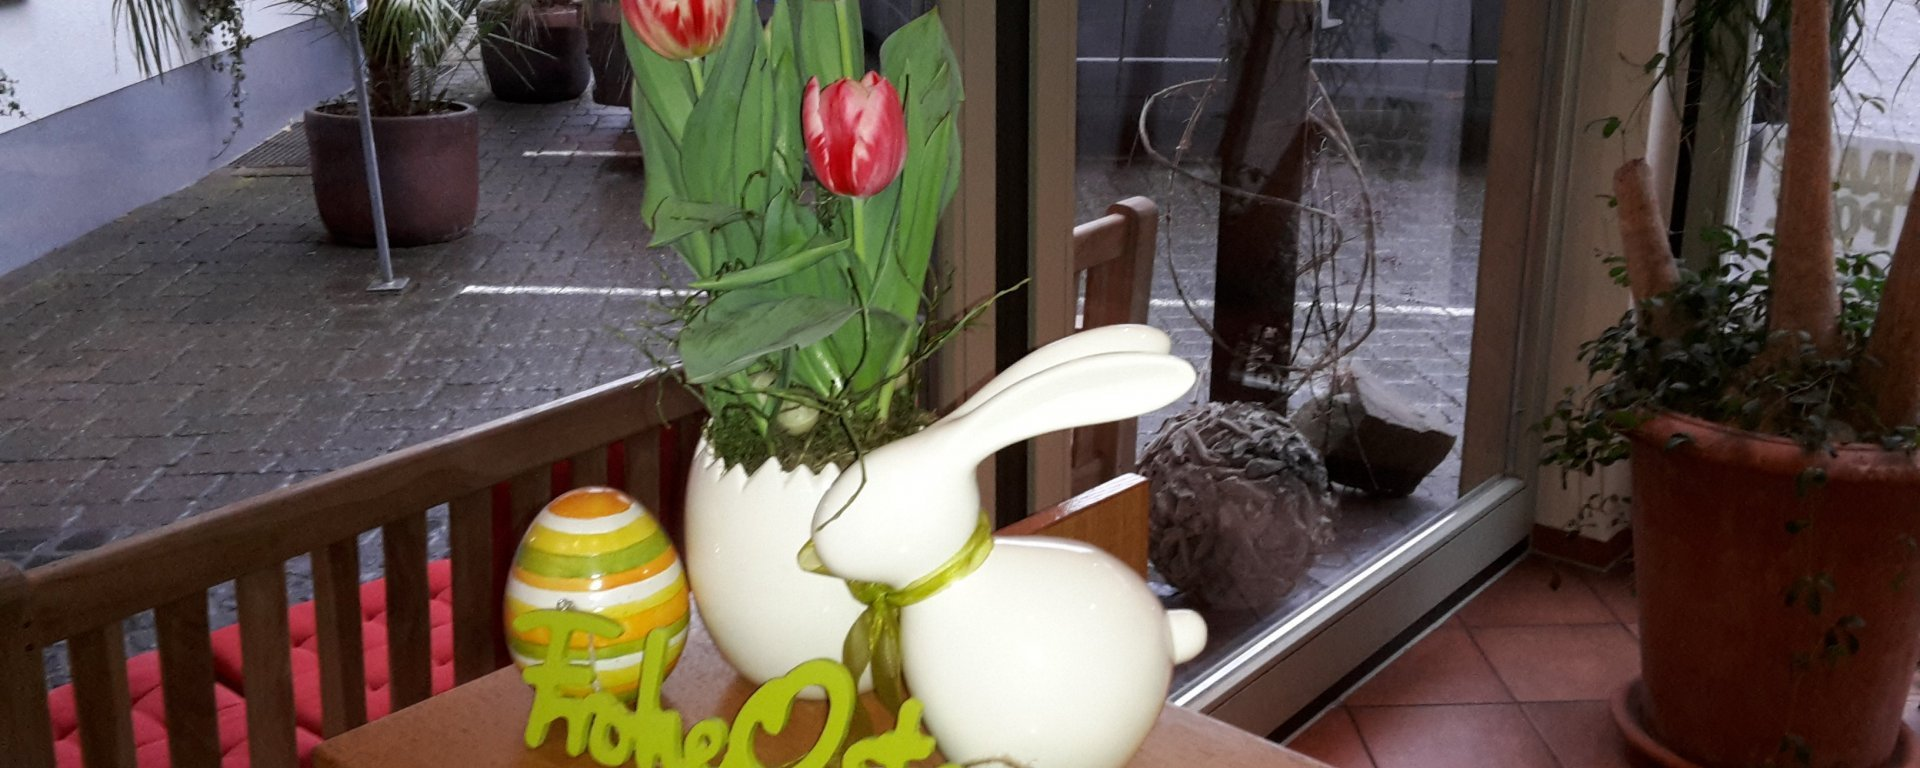 Ostern im Ahrtal, 3 Nächte